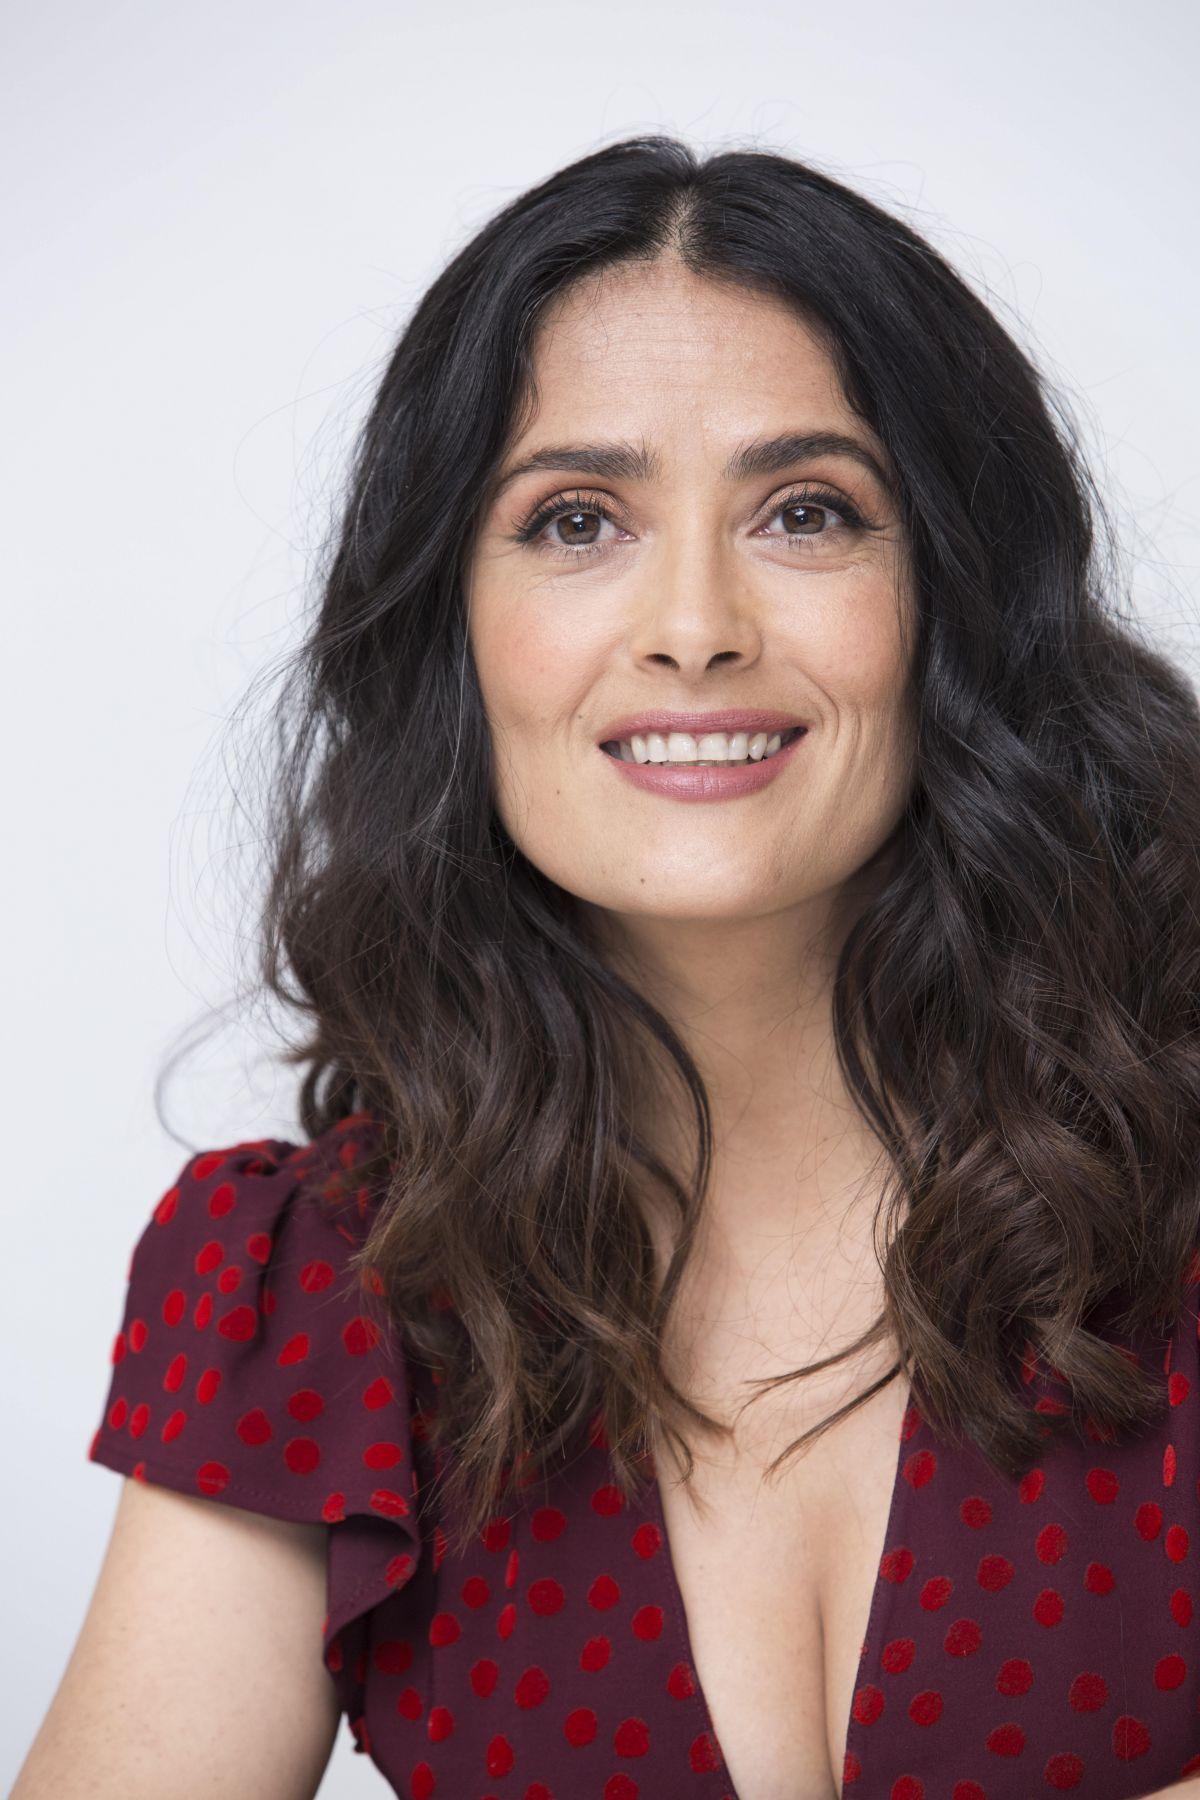 Salma hayek sexy lips, asin nude serves